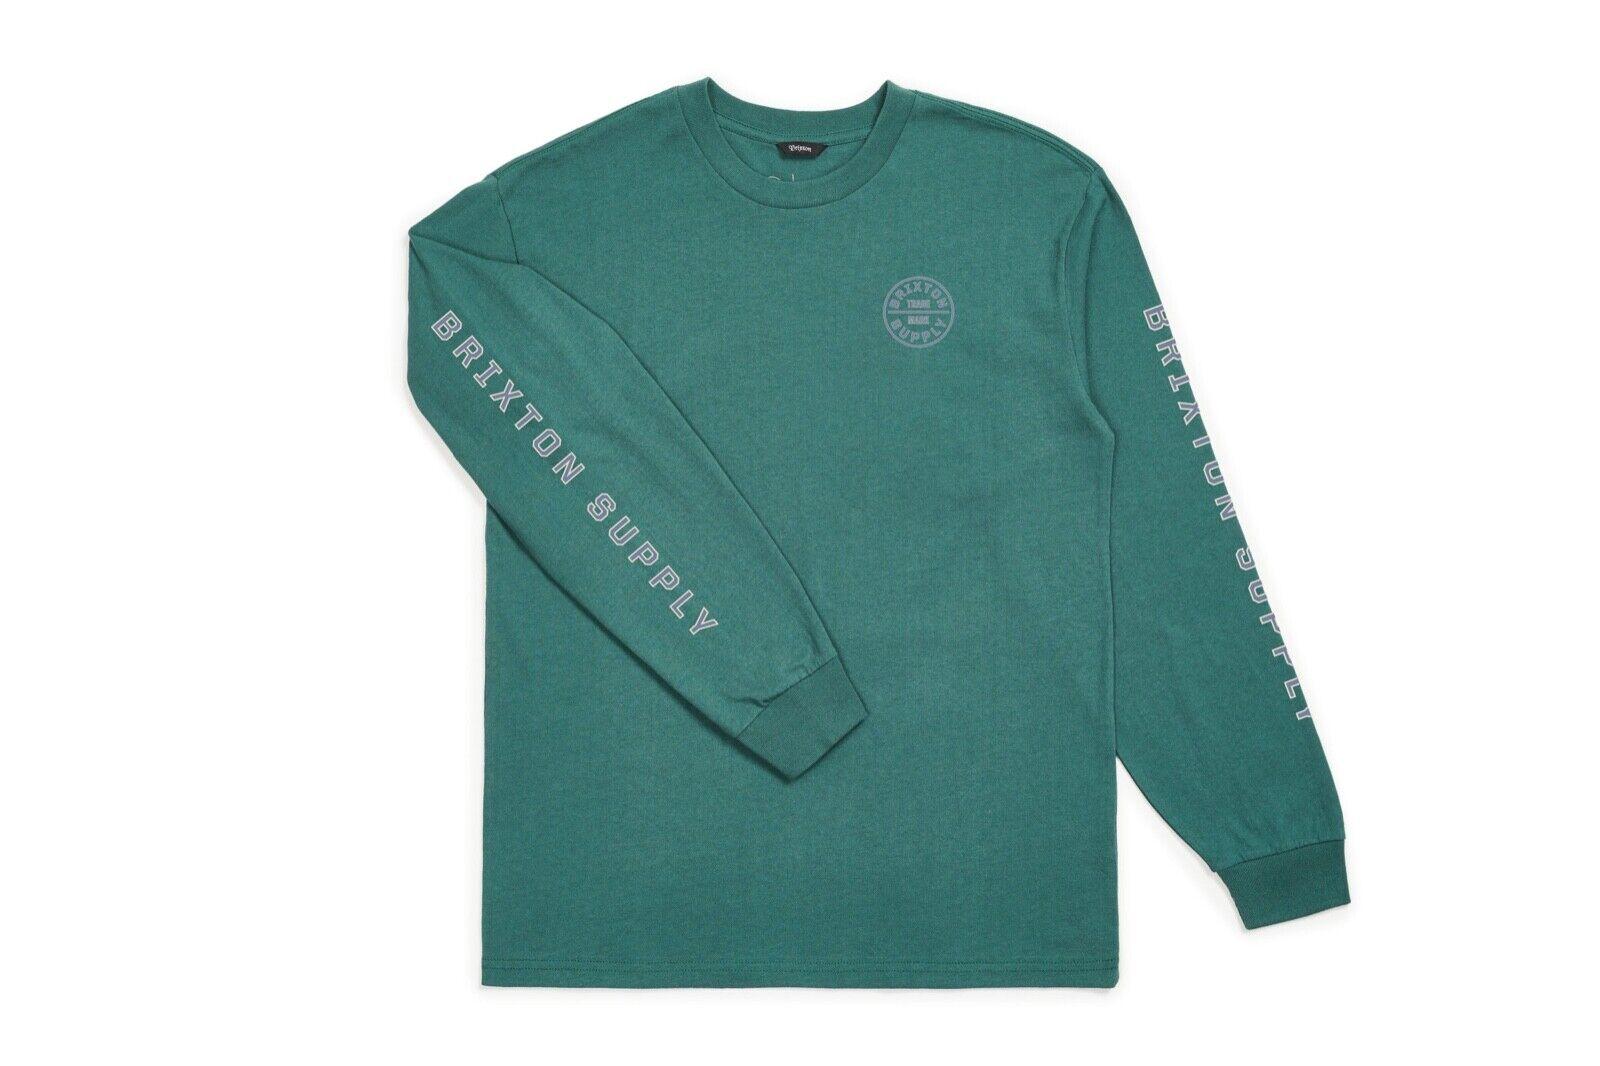 1a85f1d053 BRIXTON OATH IV NEU EMERALD GR BRIXTON SUPPLY LONGSLEEVE M nznyns19979-T- Shirts. Weatherproof Mens Flannel Button Up Shirt Menu